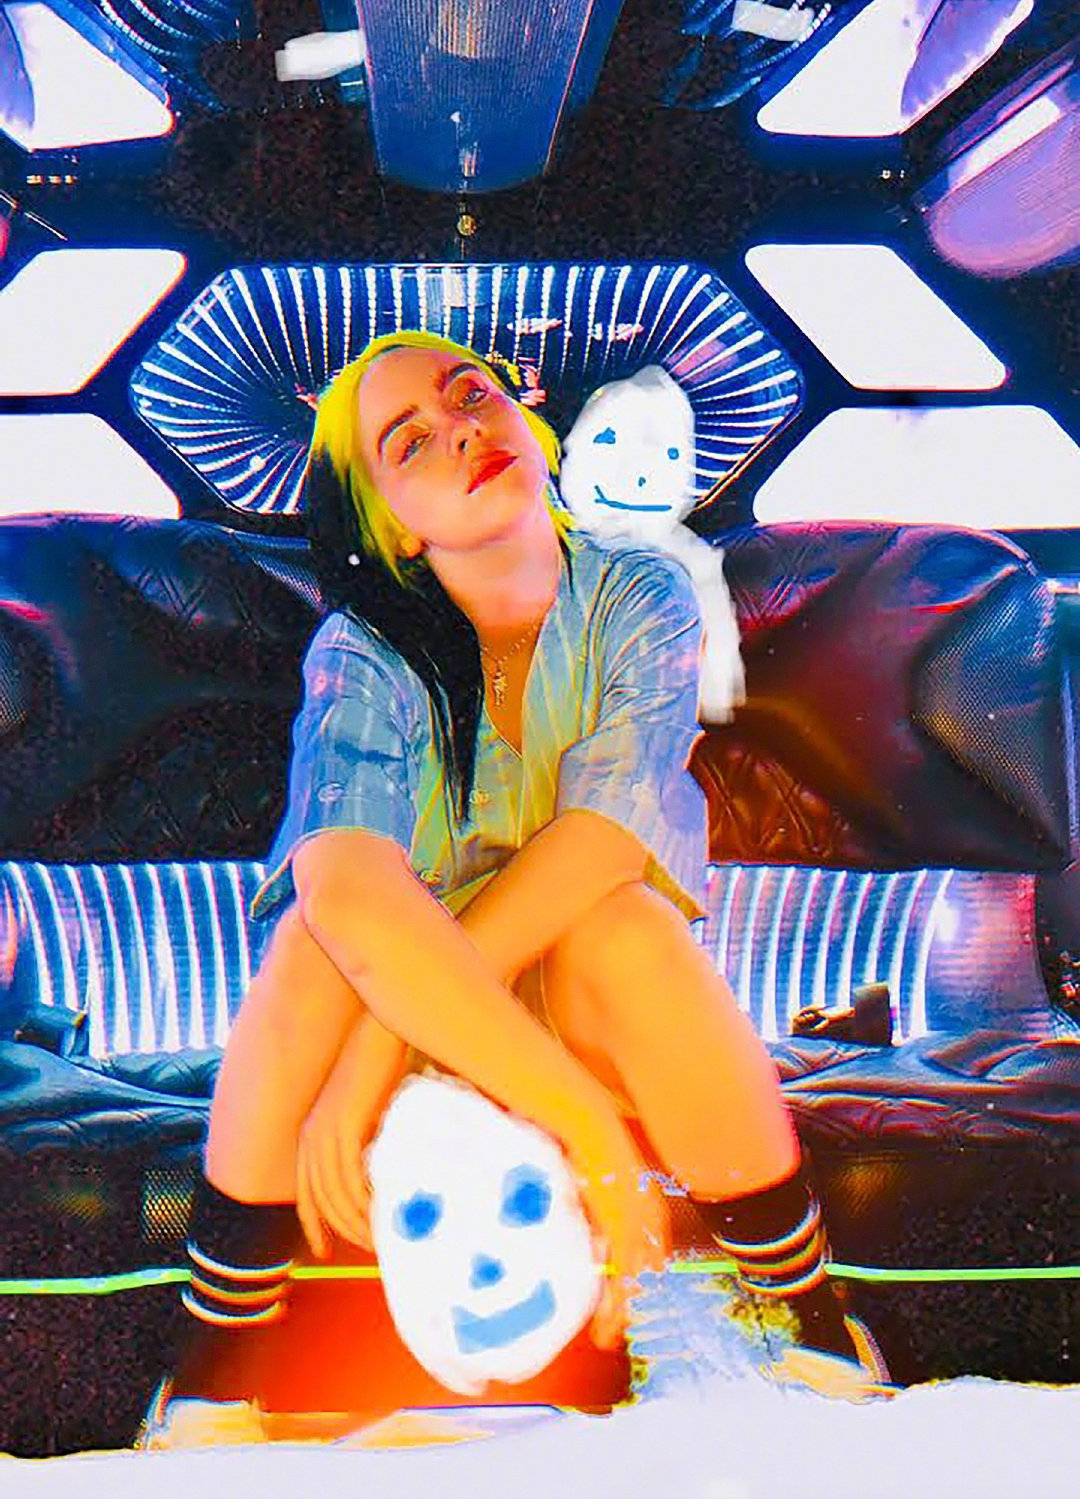 Billie Eilish Dazed 2020 5 - Фото: Билли Айлиш на обложке журнала Dazed